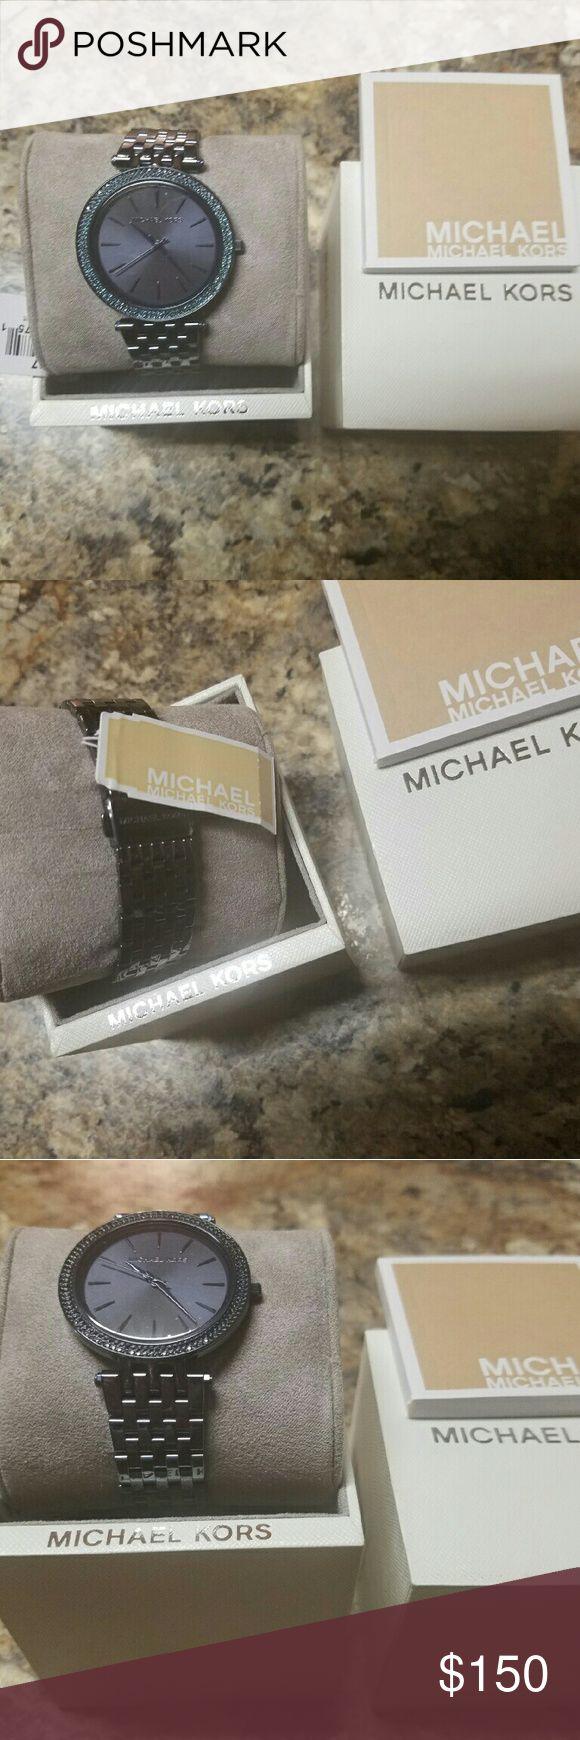 New Navy Blue Michael Kors Watch Limited Brand New Michael Kors Watch Michael Kors Accessories Watches